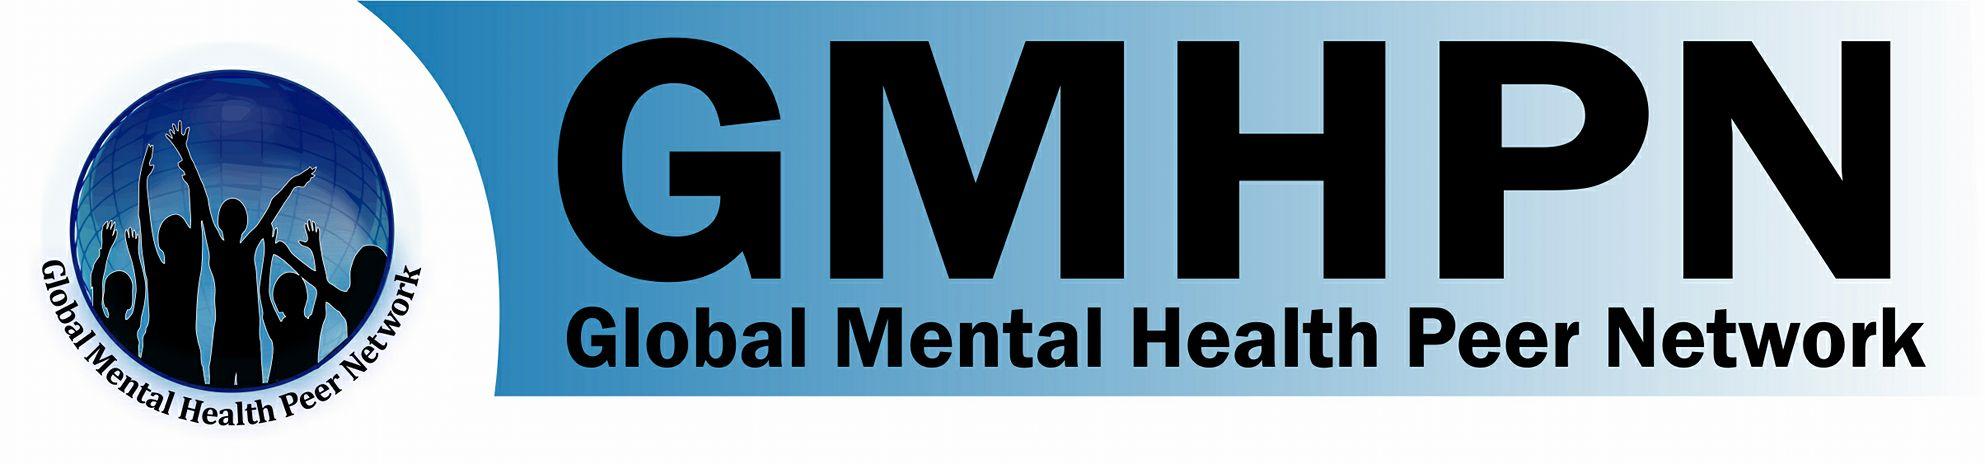 GMHPN Logo